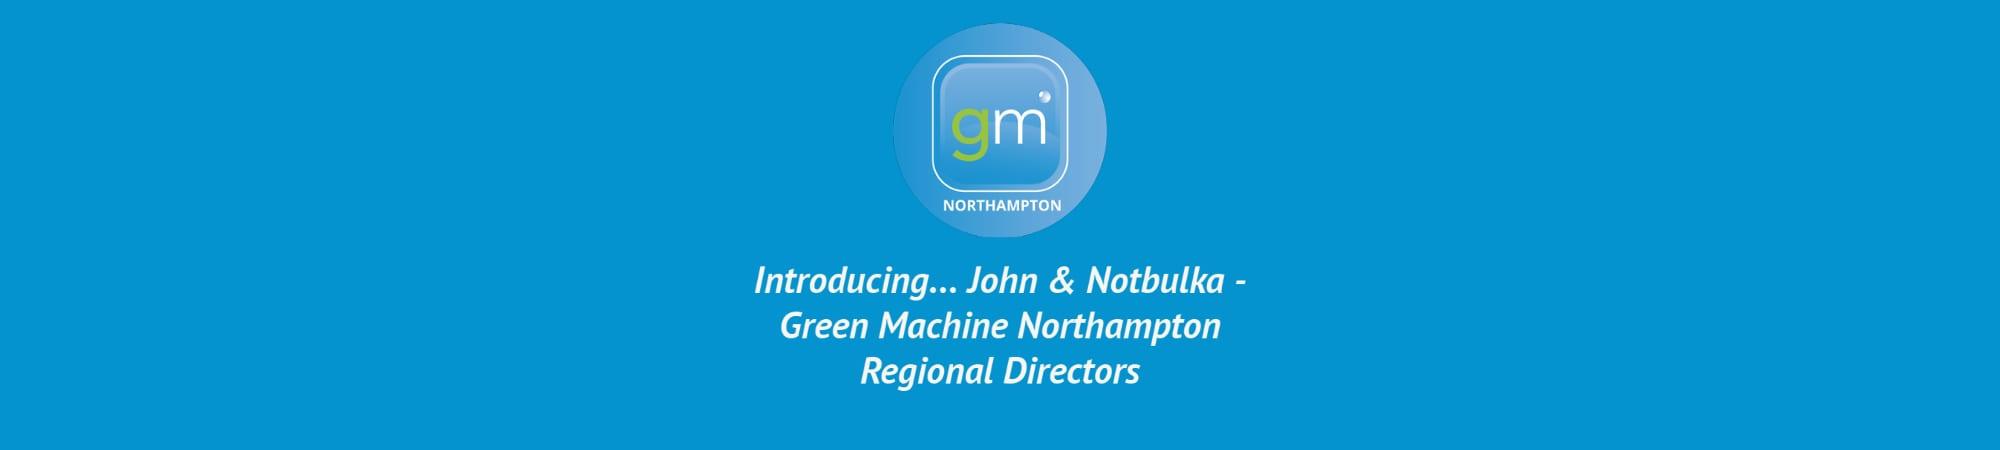 green machine northampton